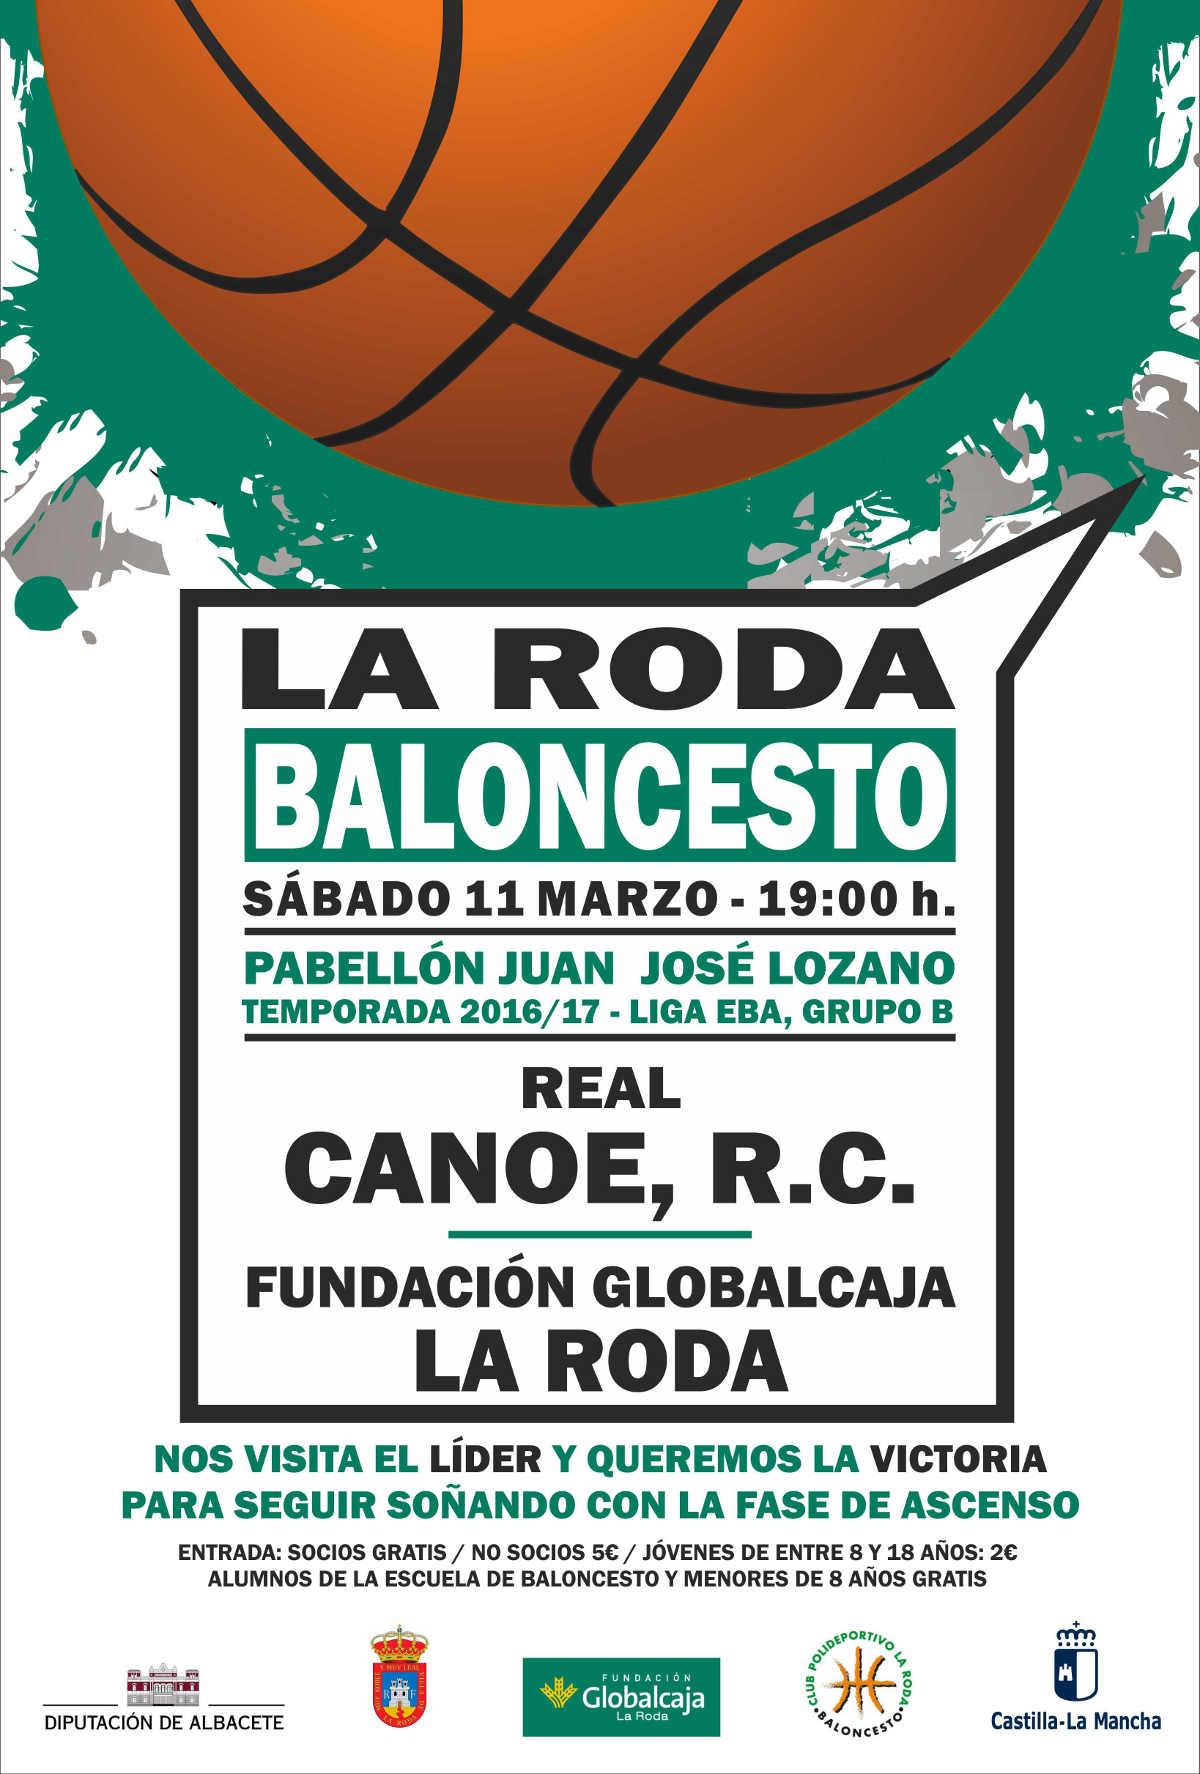 Cartel Fundación Globalcaja La Roda - Real Canoe